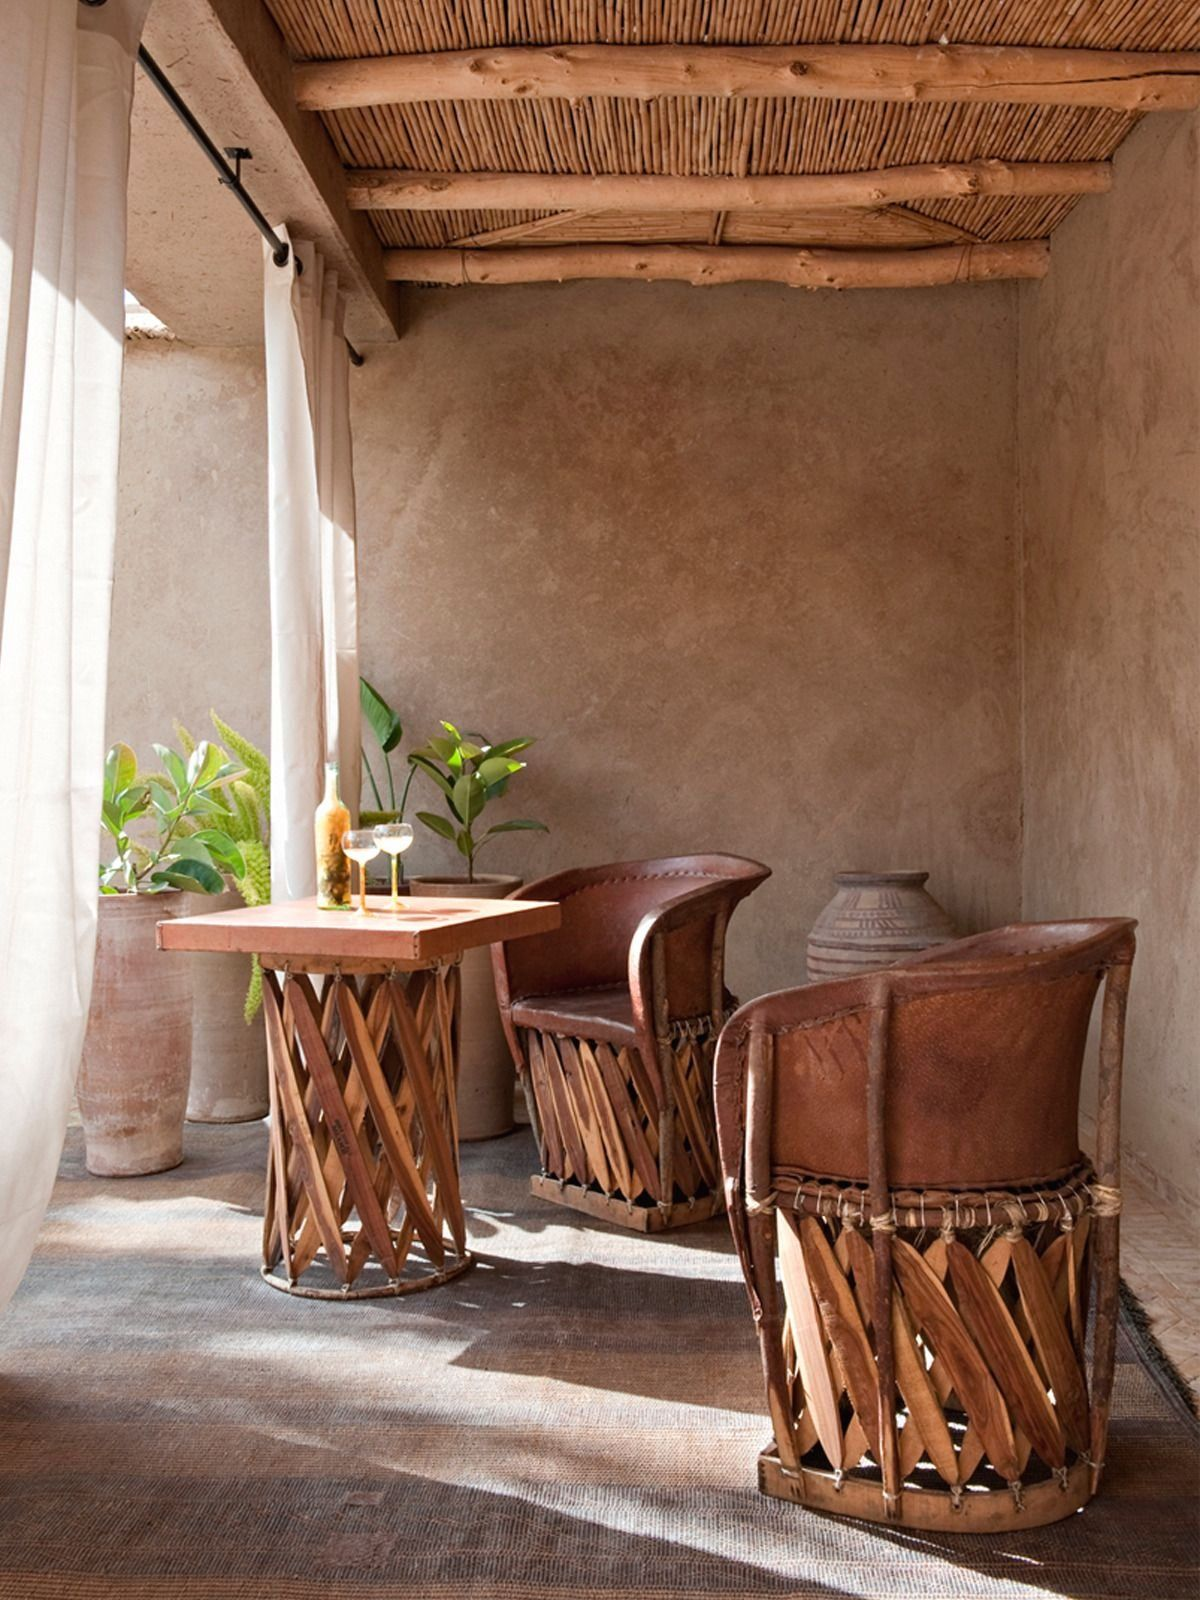 sabonhomeblog | 1000 in 2020 | Outdoor decor backyard ... on Mexican Backyard Decor  id=86050